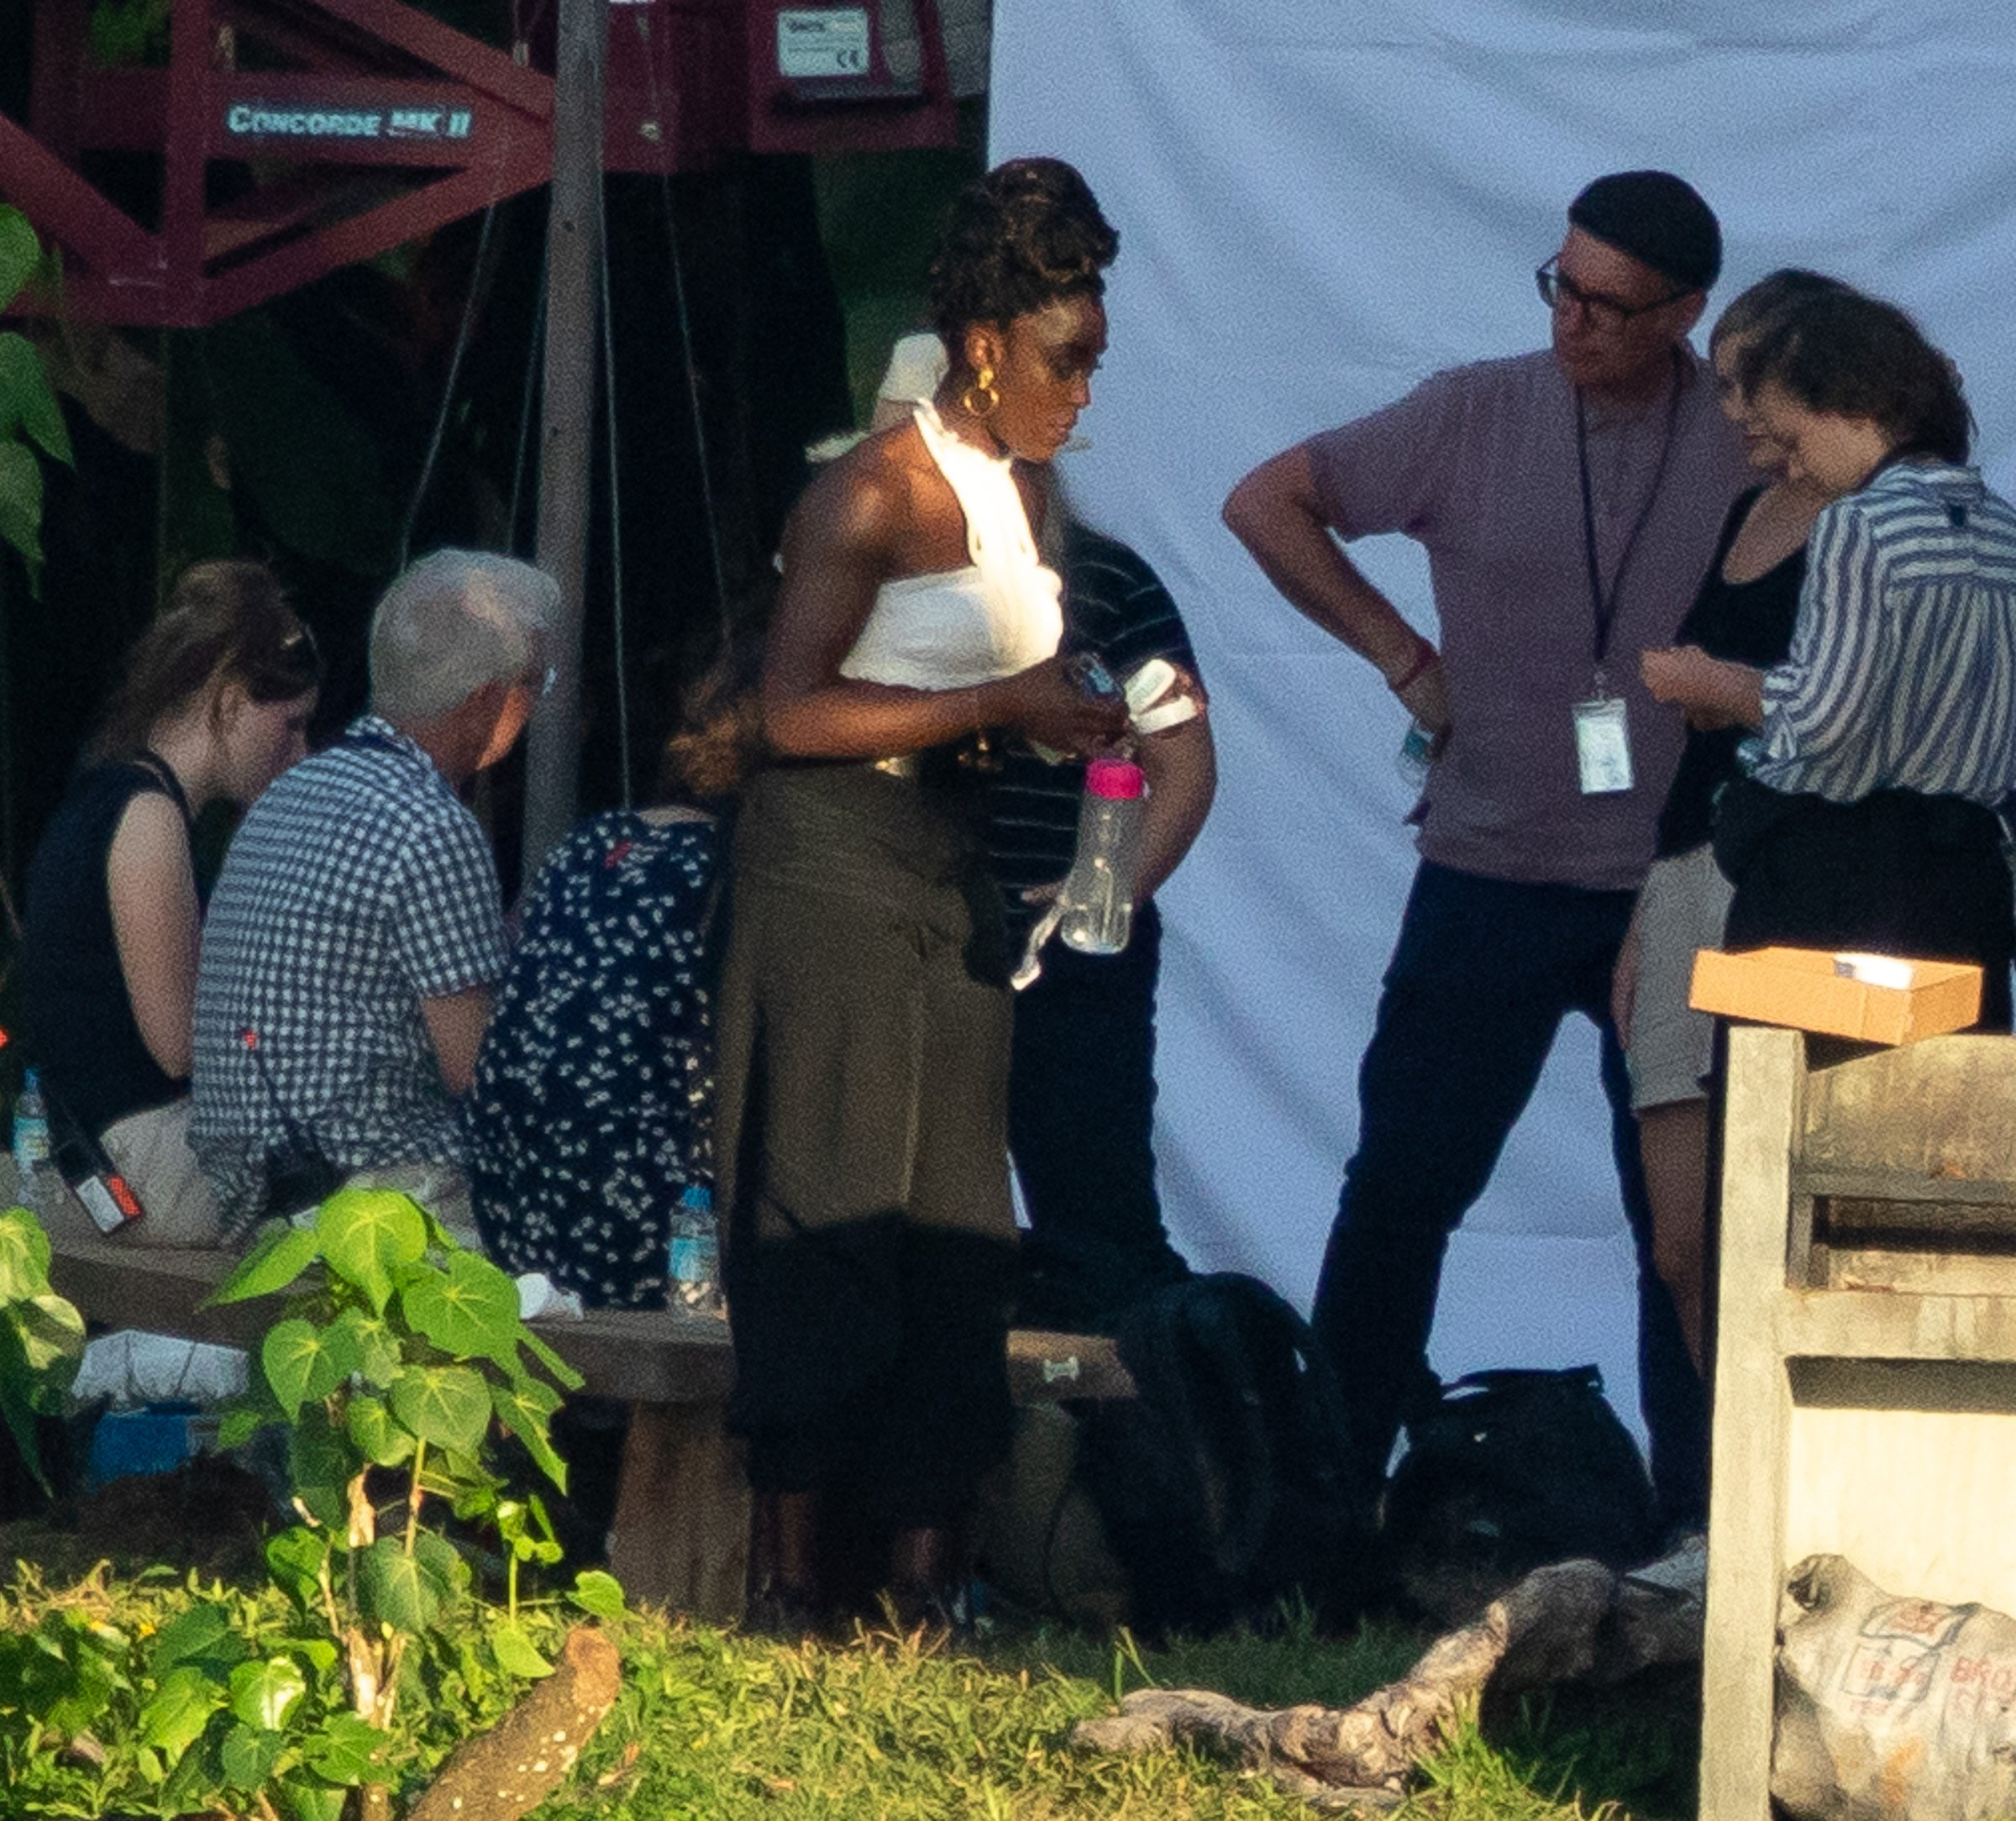 Lashana Lynch films Bond 25 scenes in Jamaica